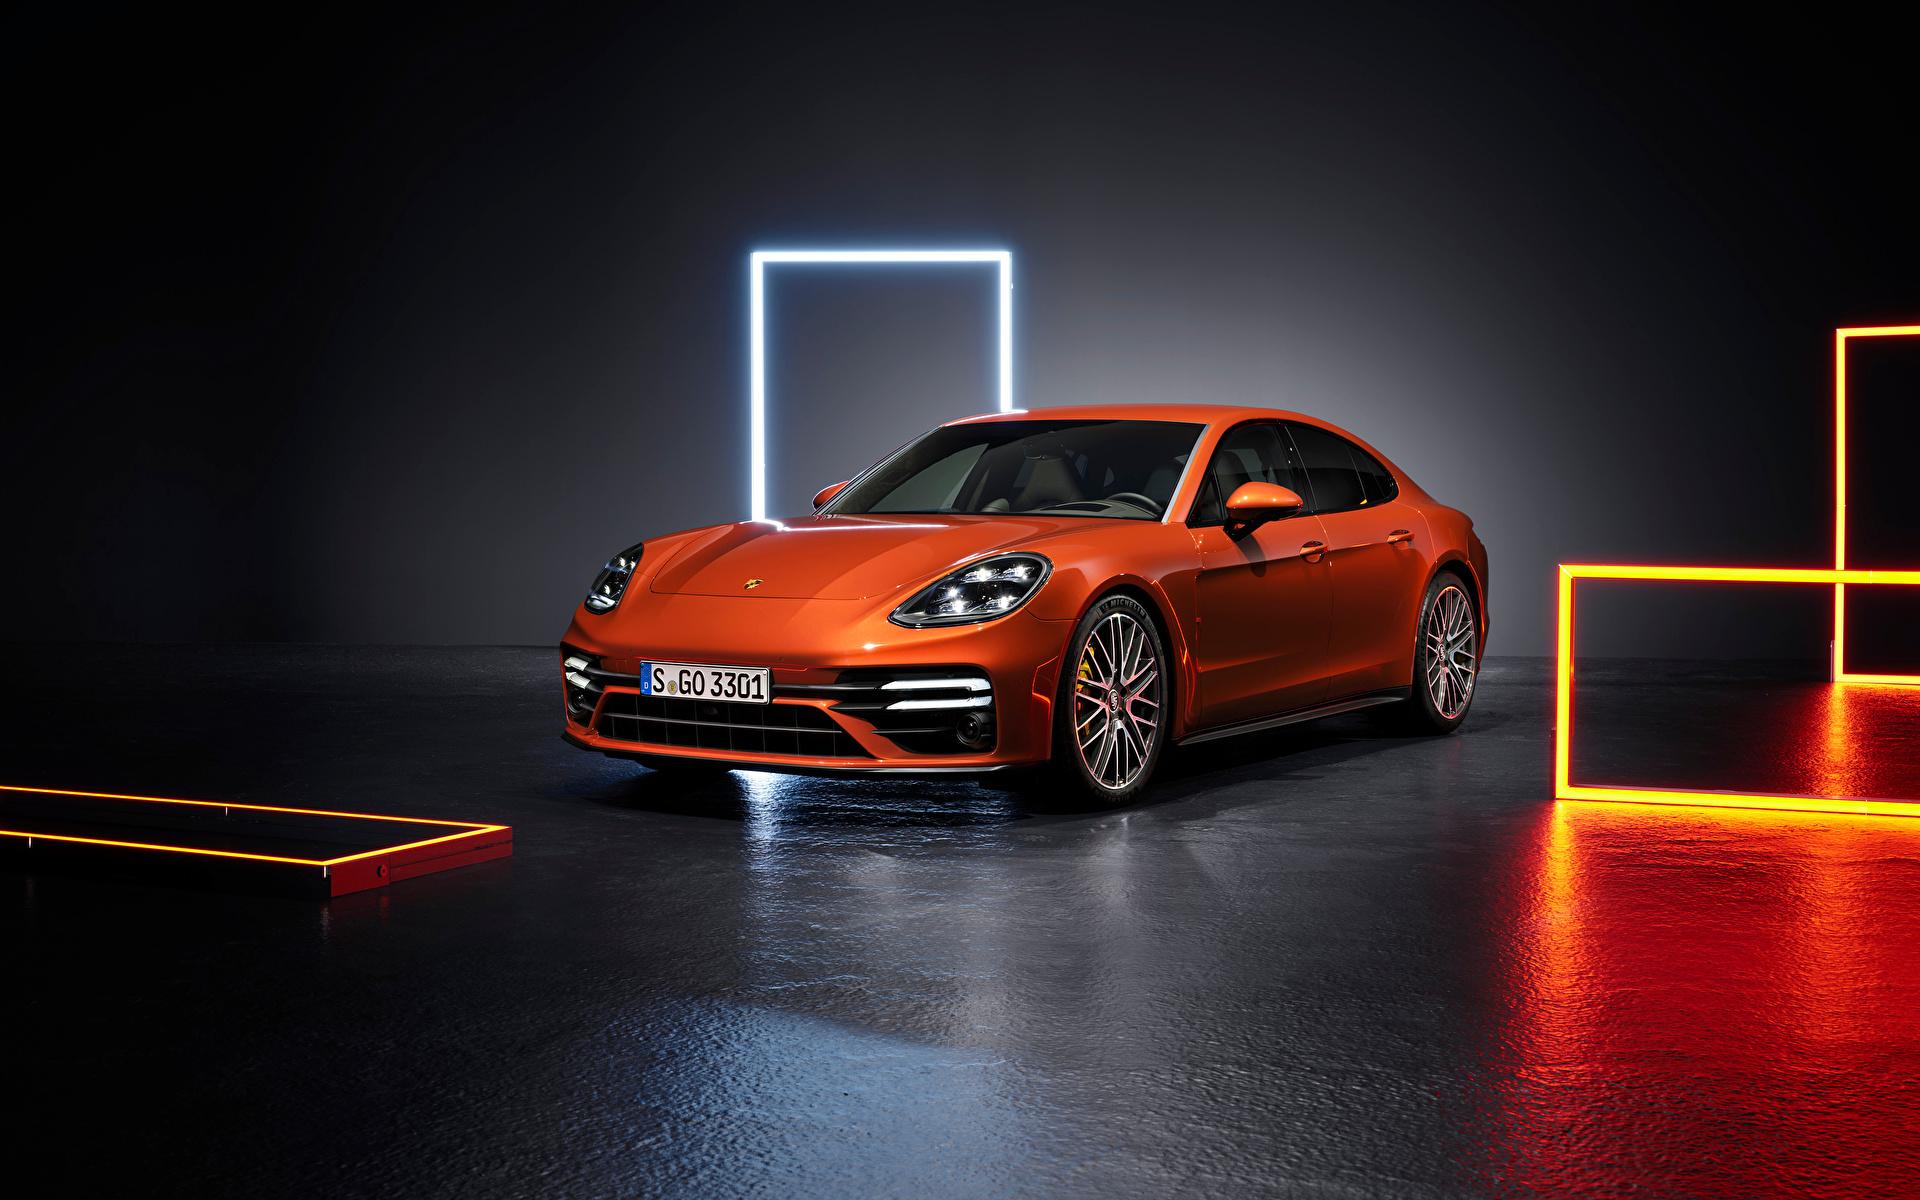 Фото Порше Panamera Turbo S (971), 2020 оранжевые машина Металлик 1920x1200 Porsche оранжевая Оранжевый оранжевых авто машины Автомобили автомобиль